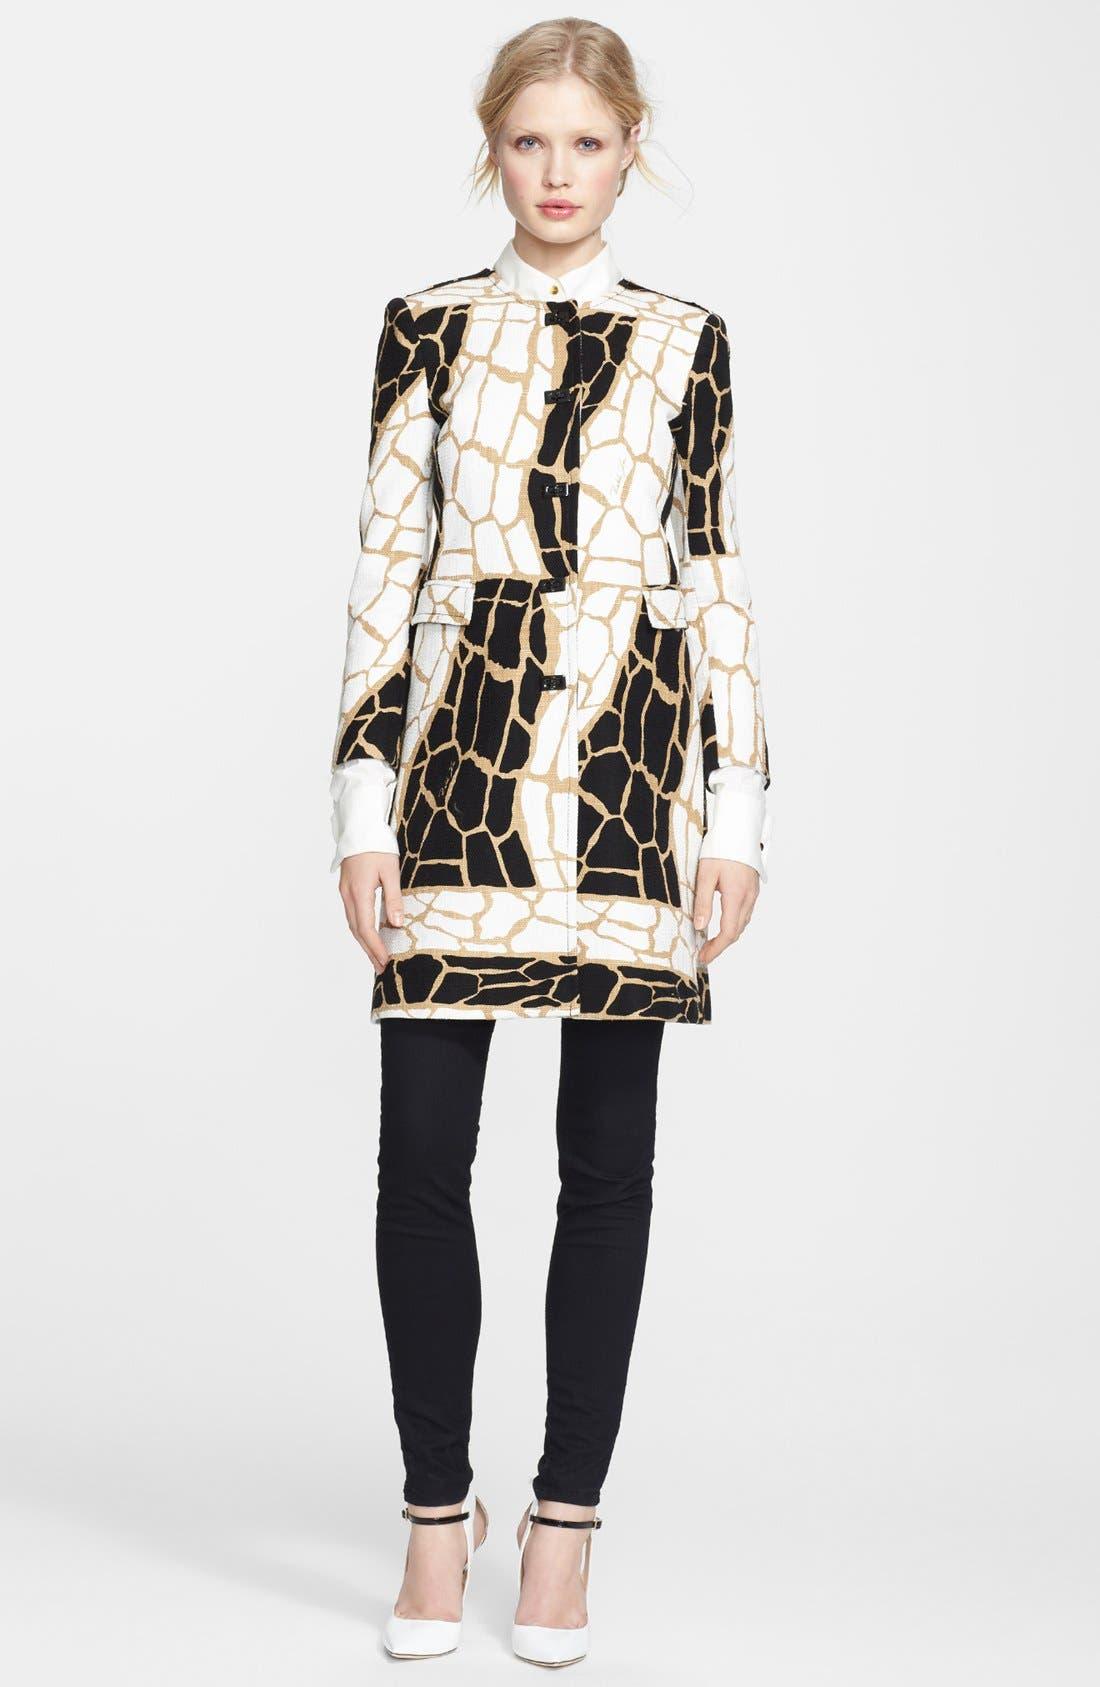 Alternate Image 1 Selected - Rachel Zoe 'Mena' Giraffe Print Coat